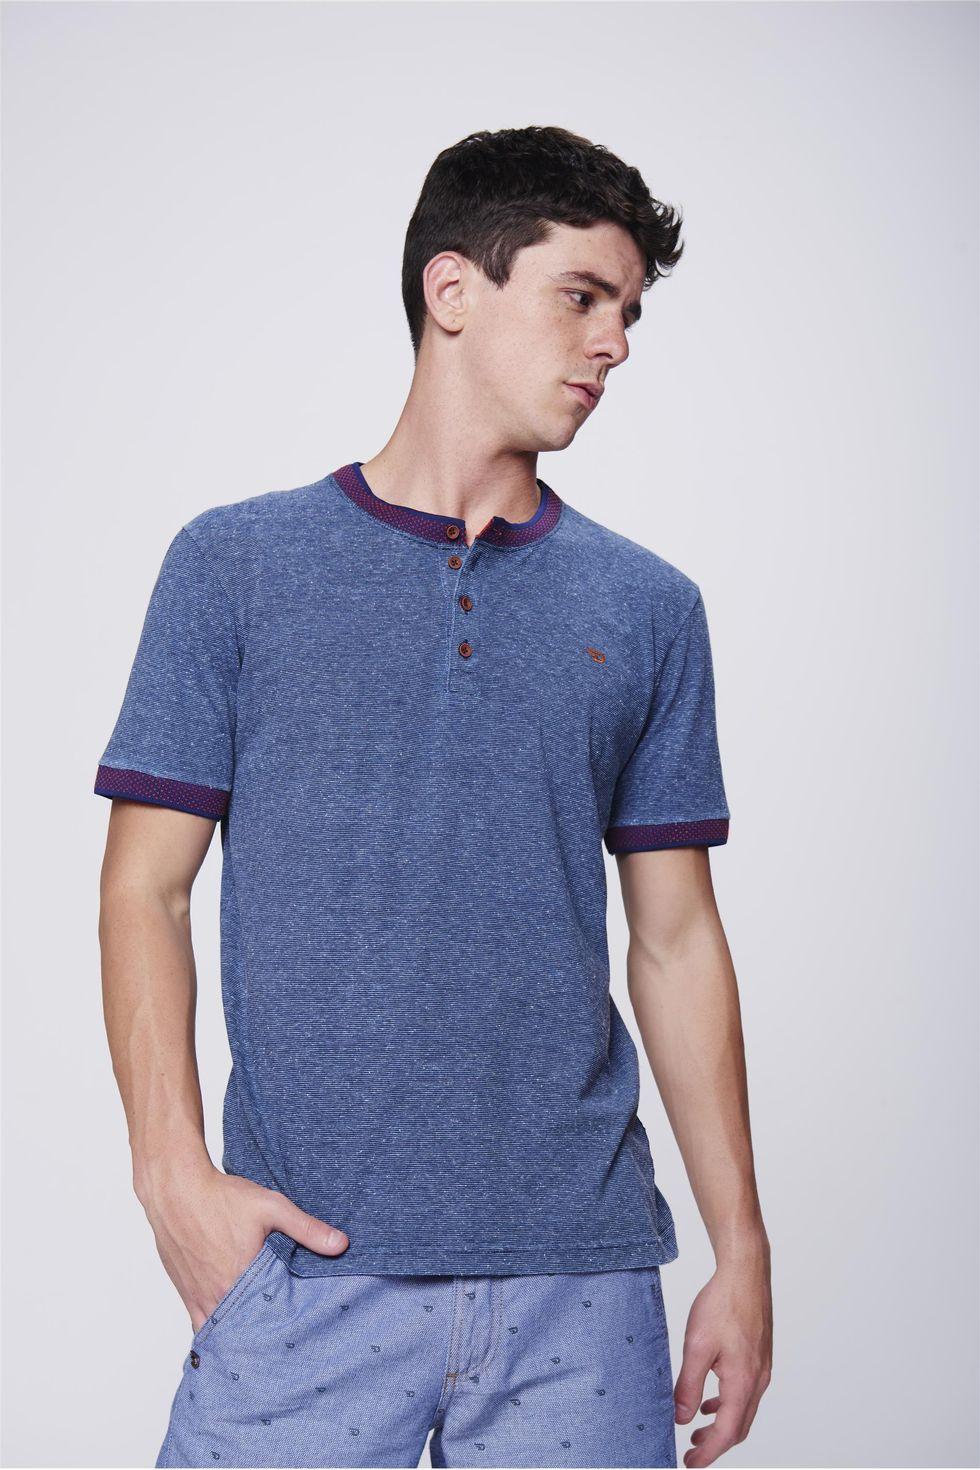 Camiseta-College-com-Botoes-Masculina-Frente--